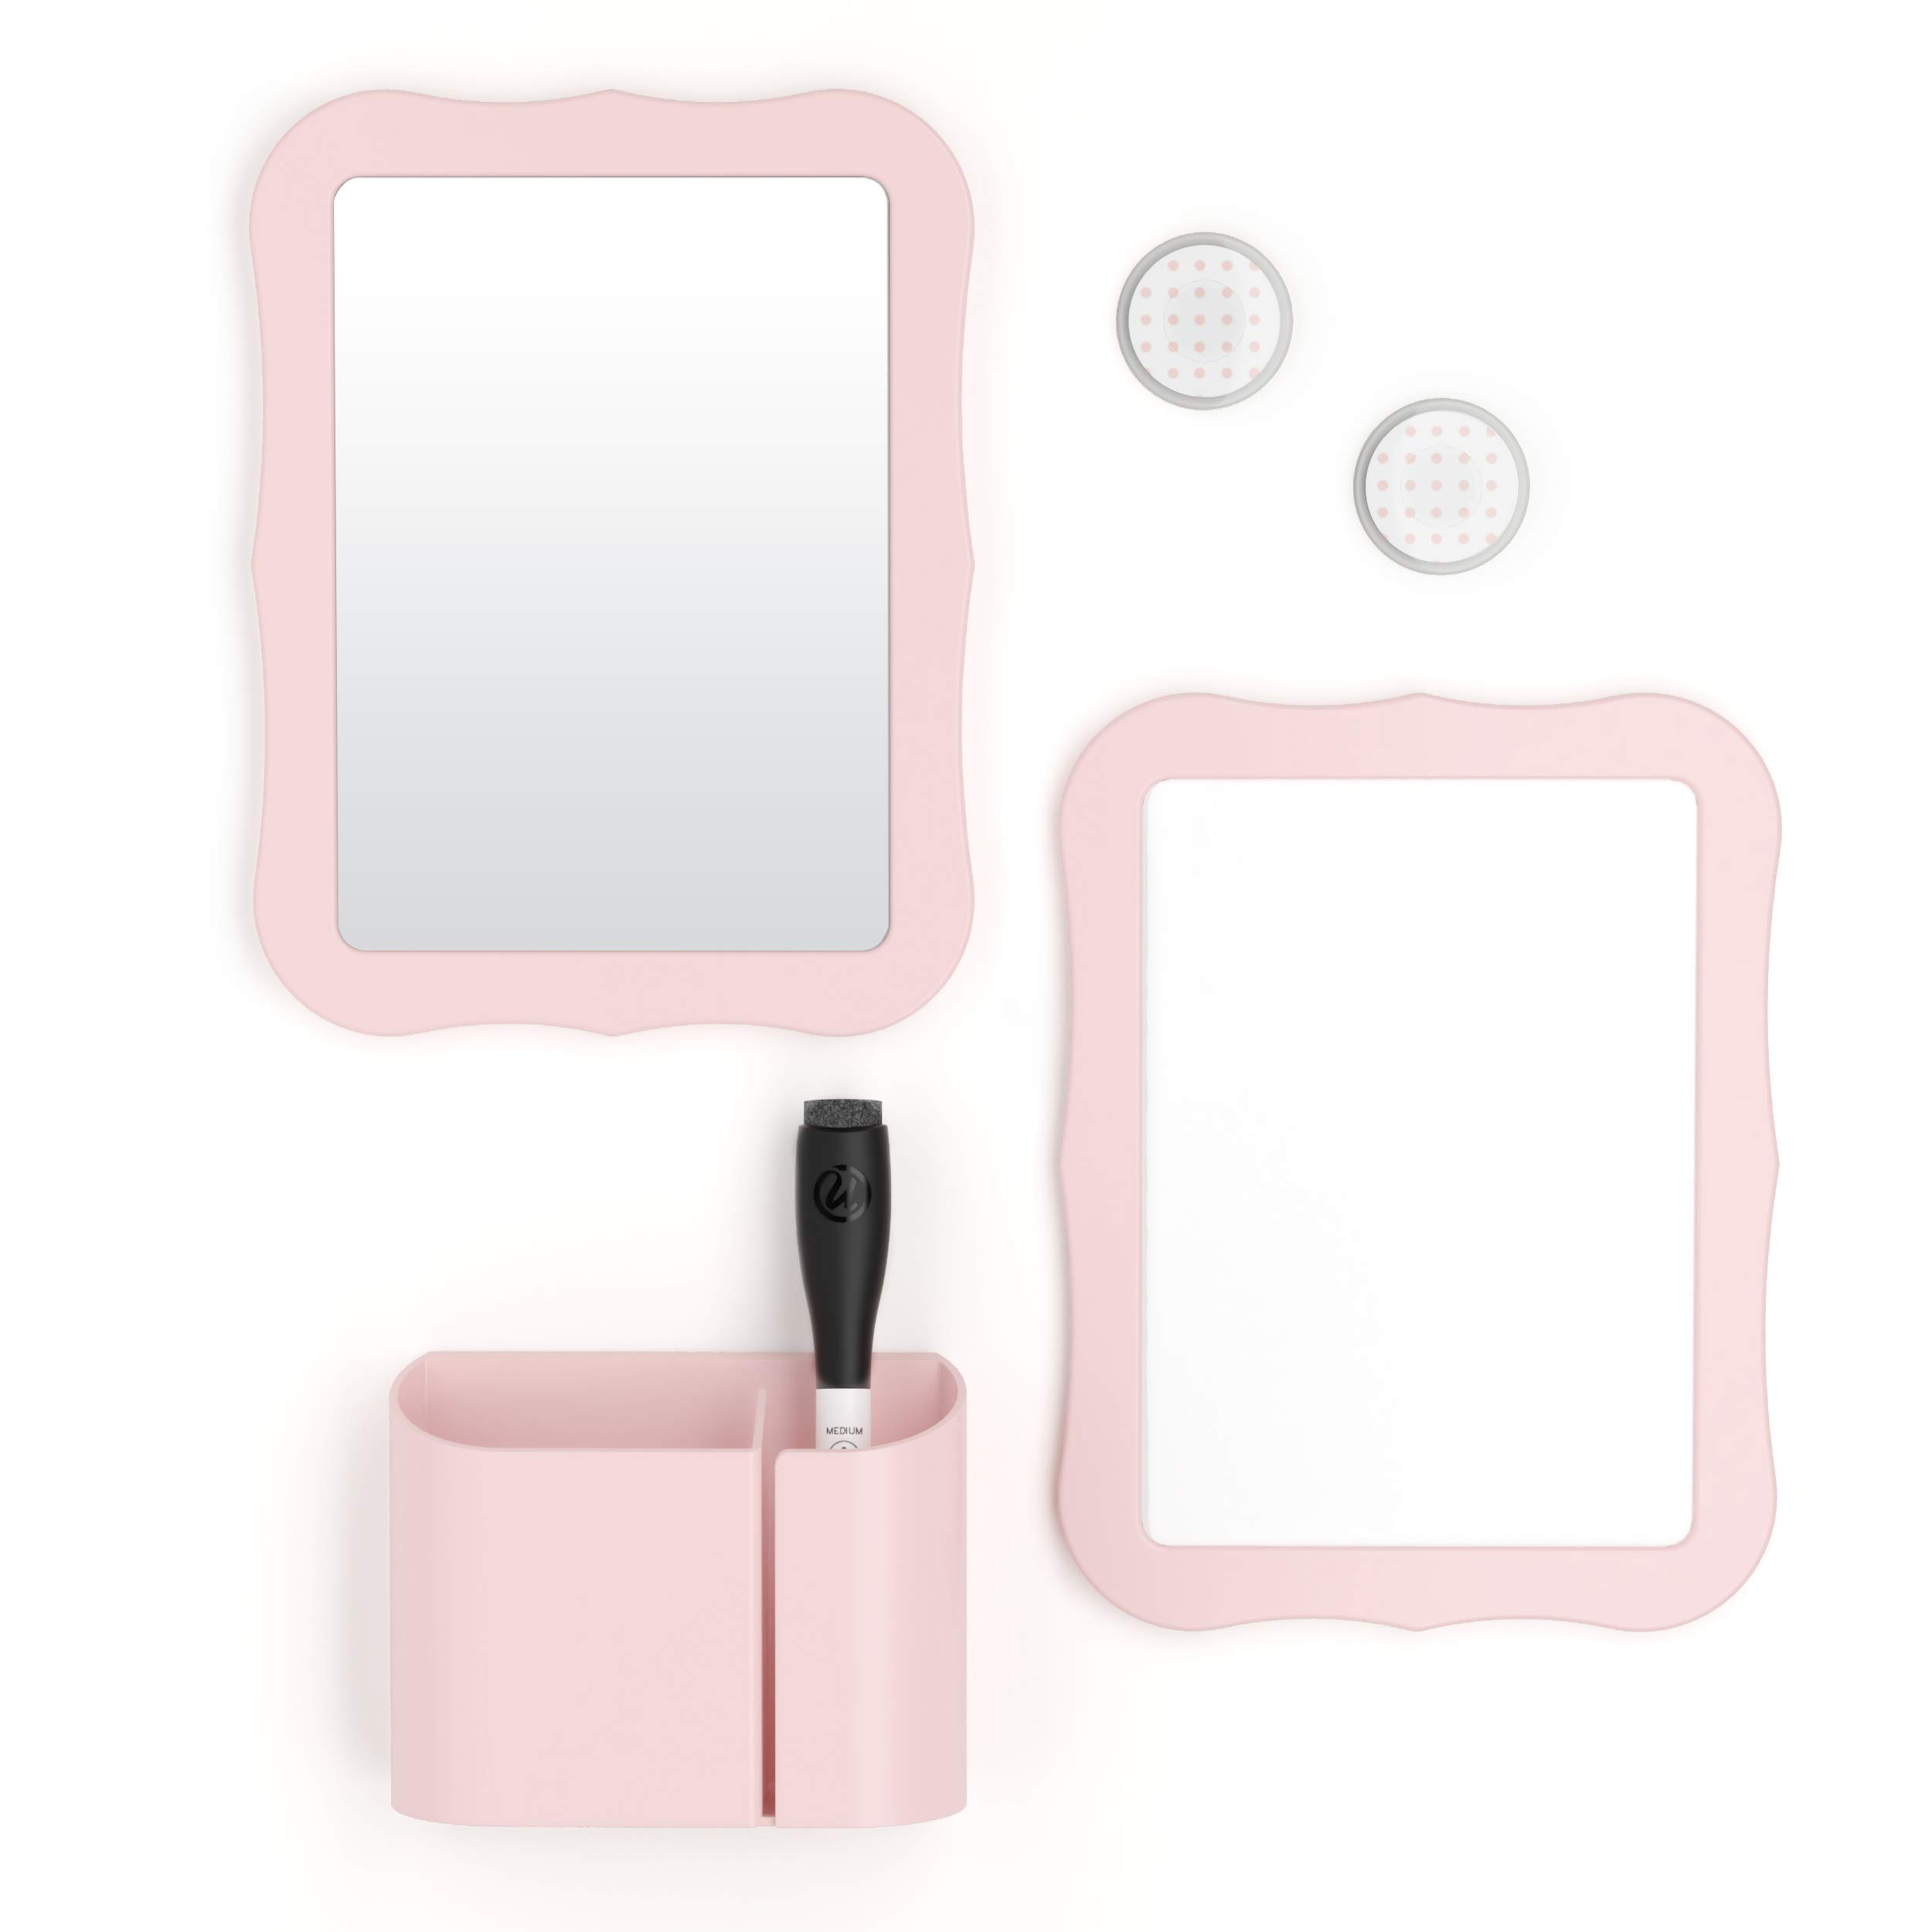 U Brands Locker Accessories Kit, Back to School Essentials, Blush, 6-Piece, Includes Whiteboard, Mirror, and Organizing Supplies by U Brands